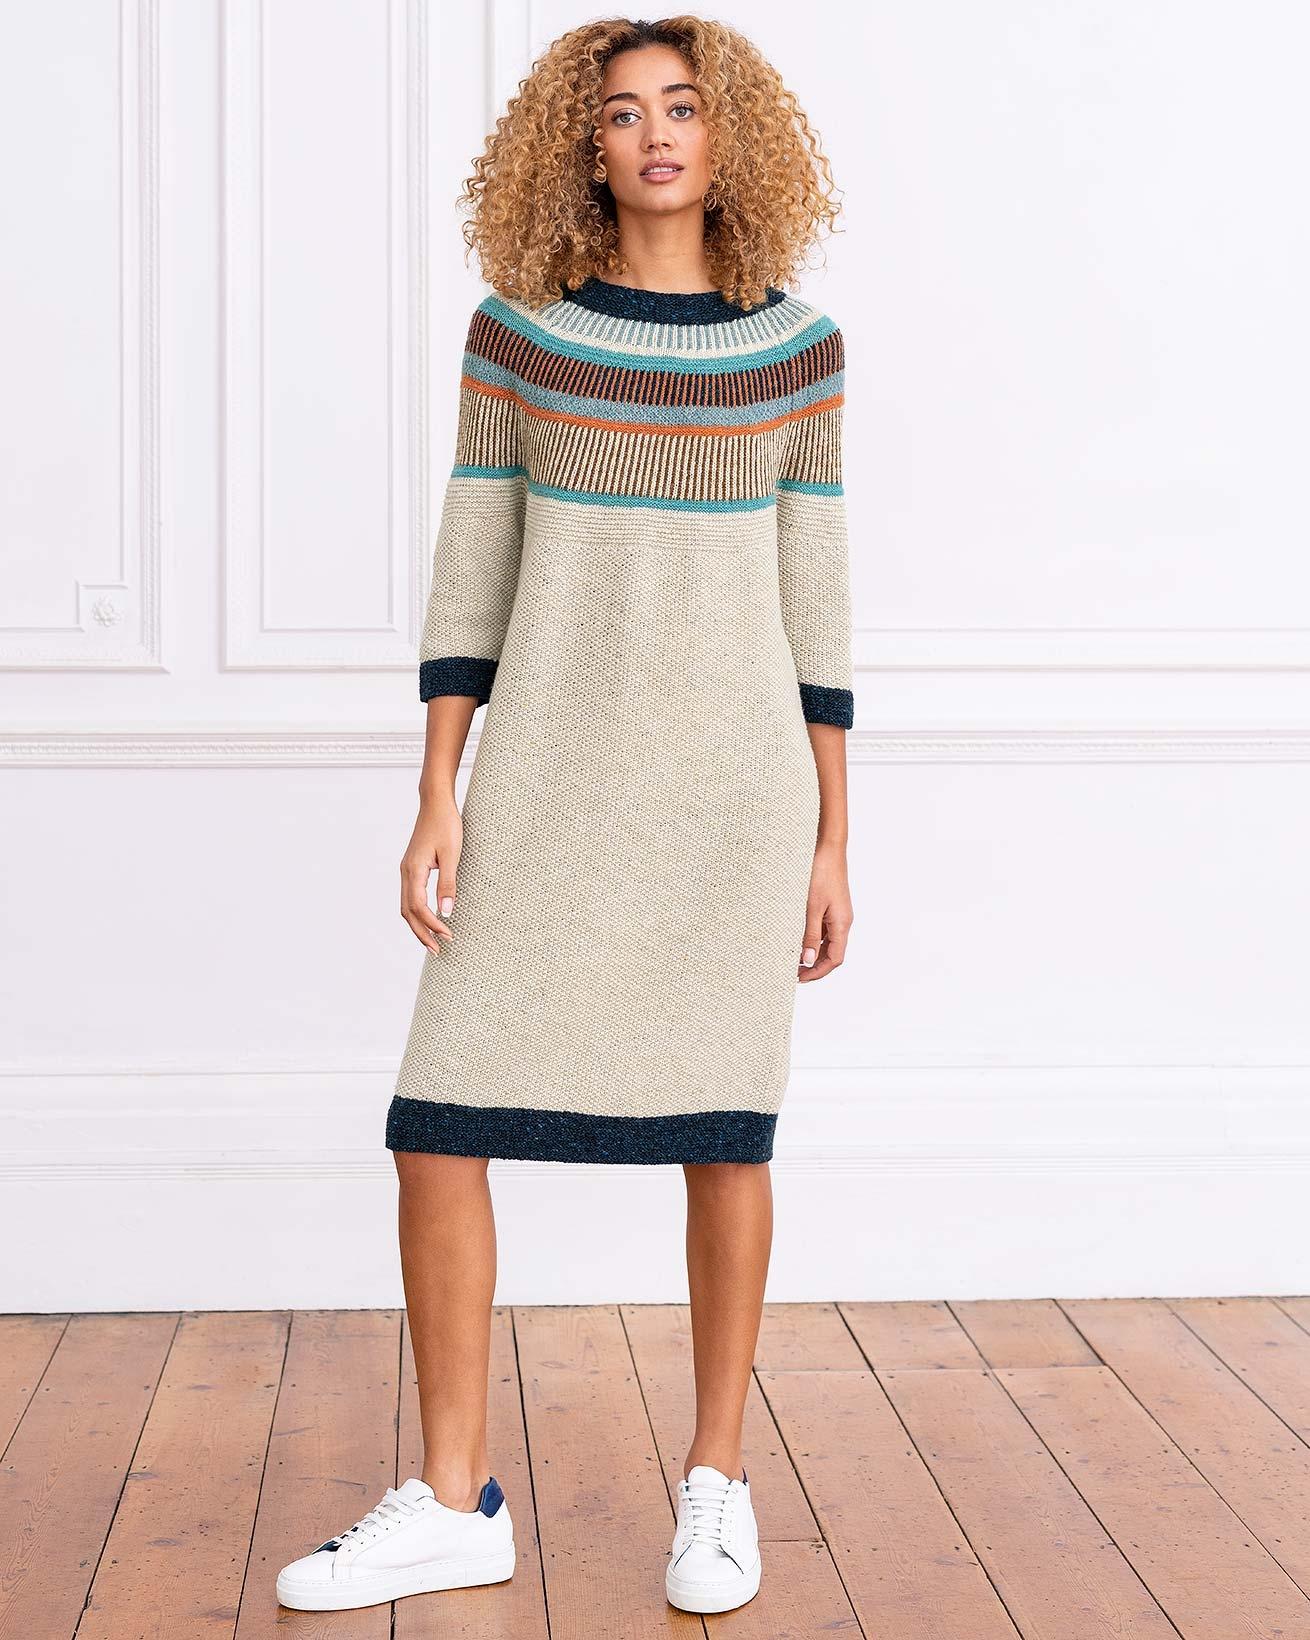 7903_statement-donegal-dress_oatmeal-46_web.jpg